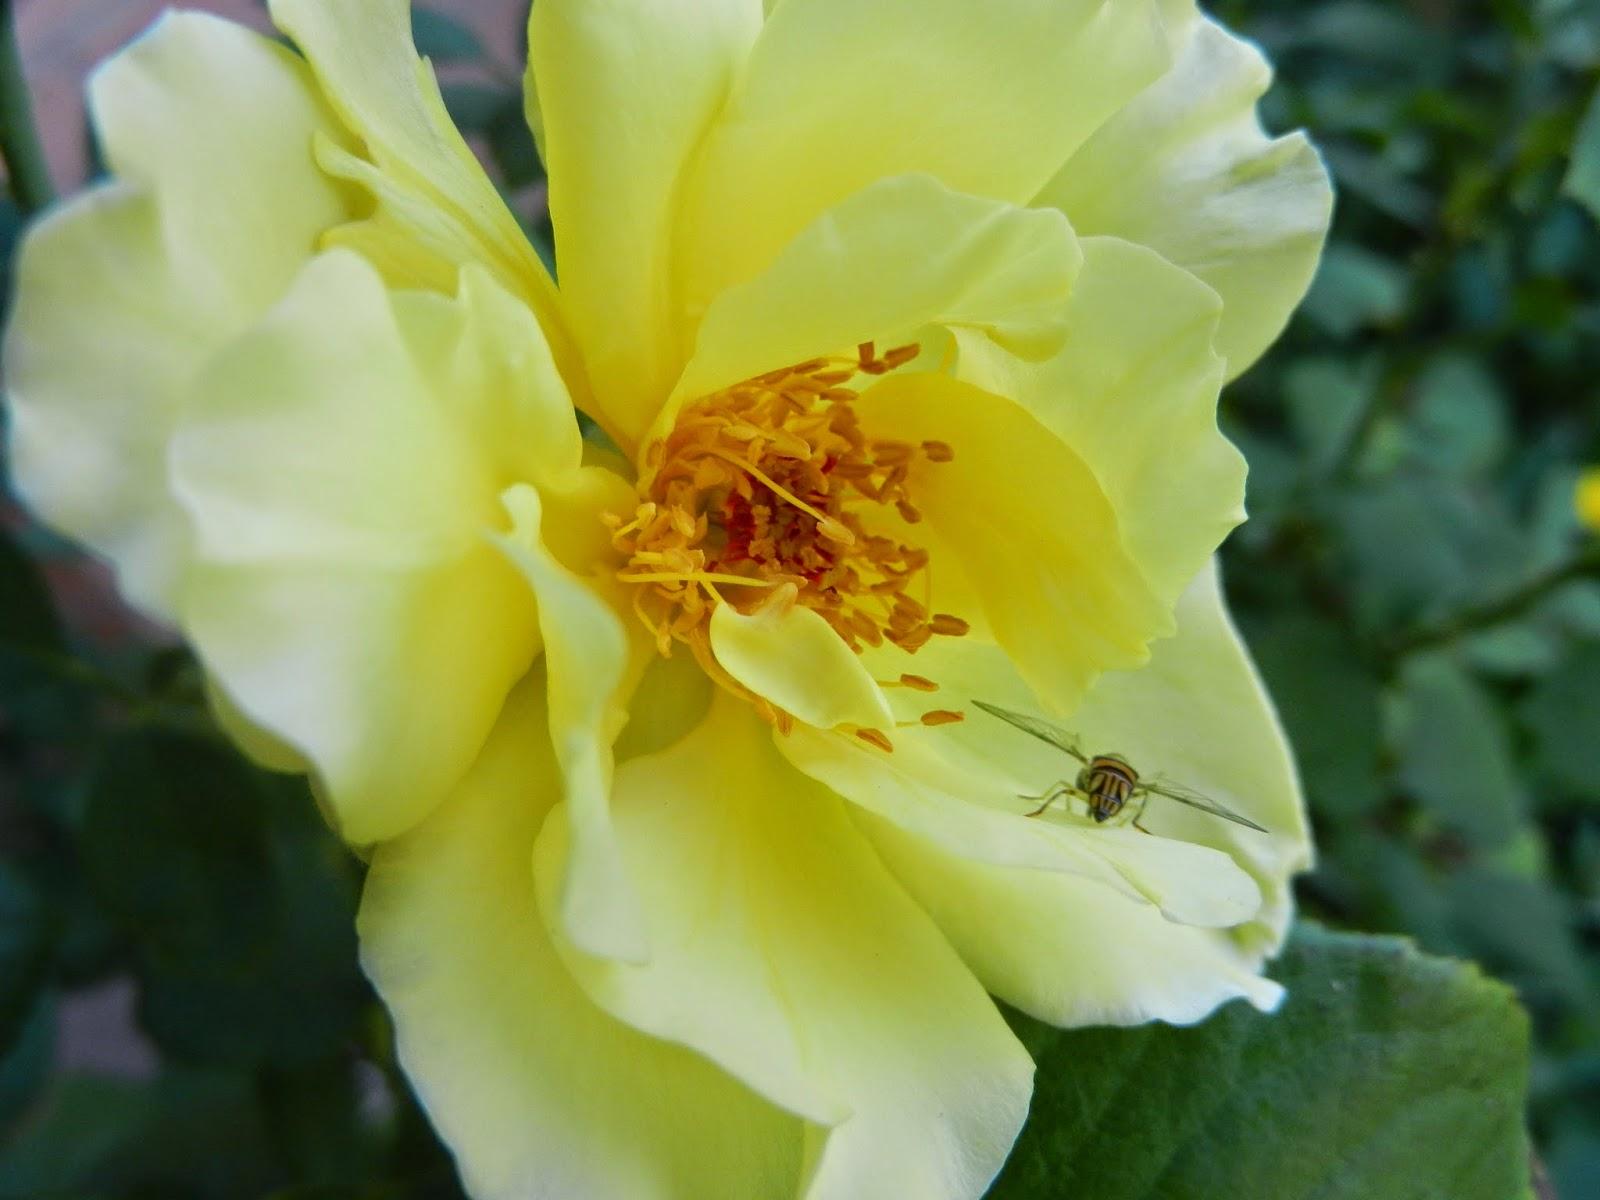 white licorice rose, white/yellow rose